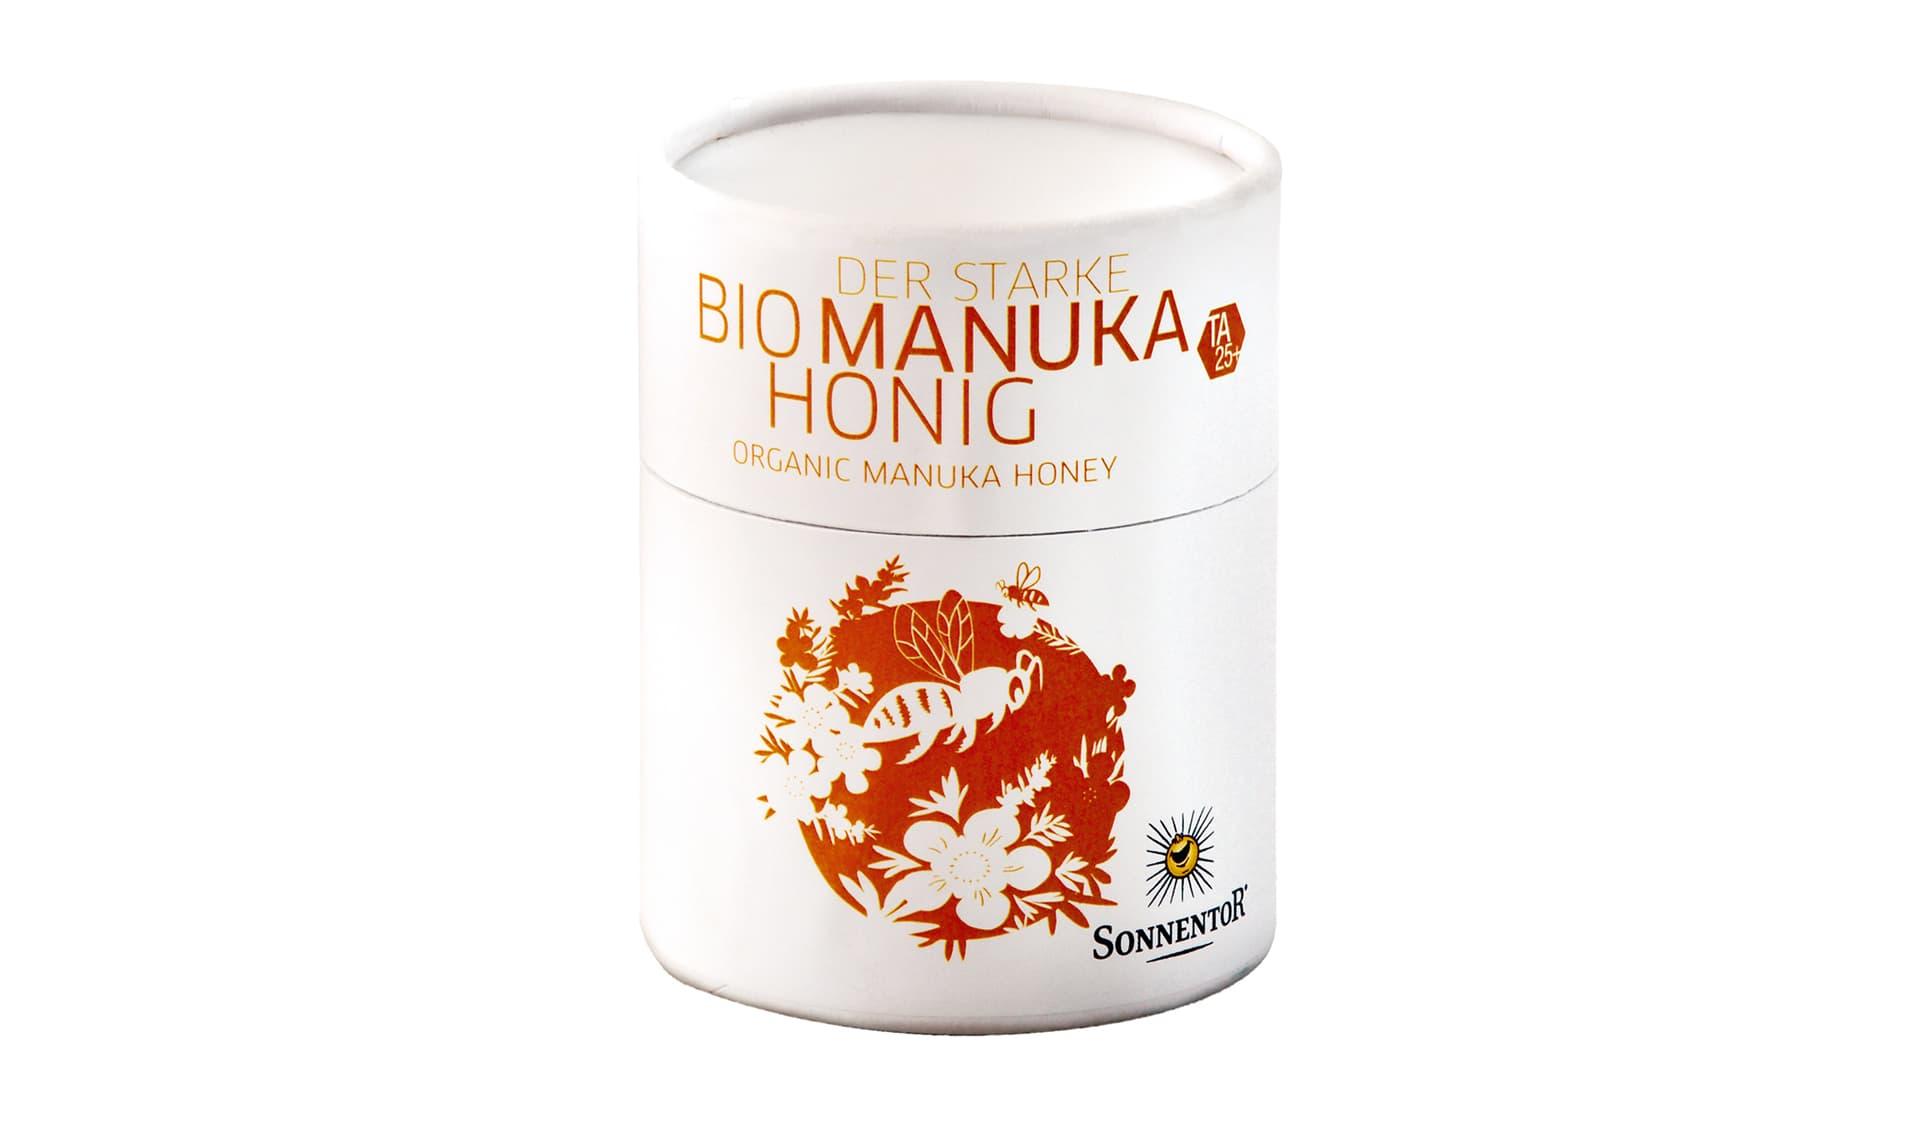 Sonnentor Manuka-Honig/ Neuseeland (www.sonnentor.de)